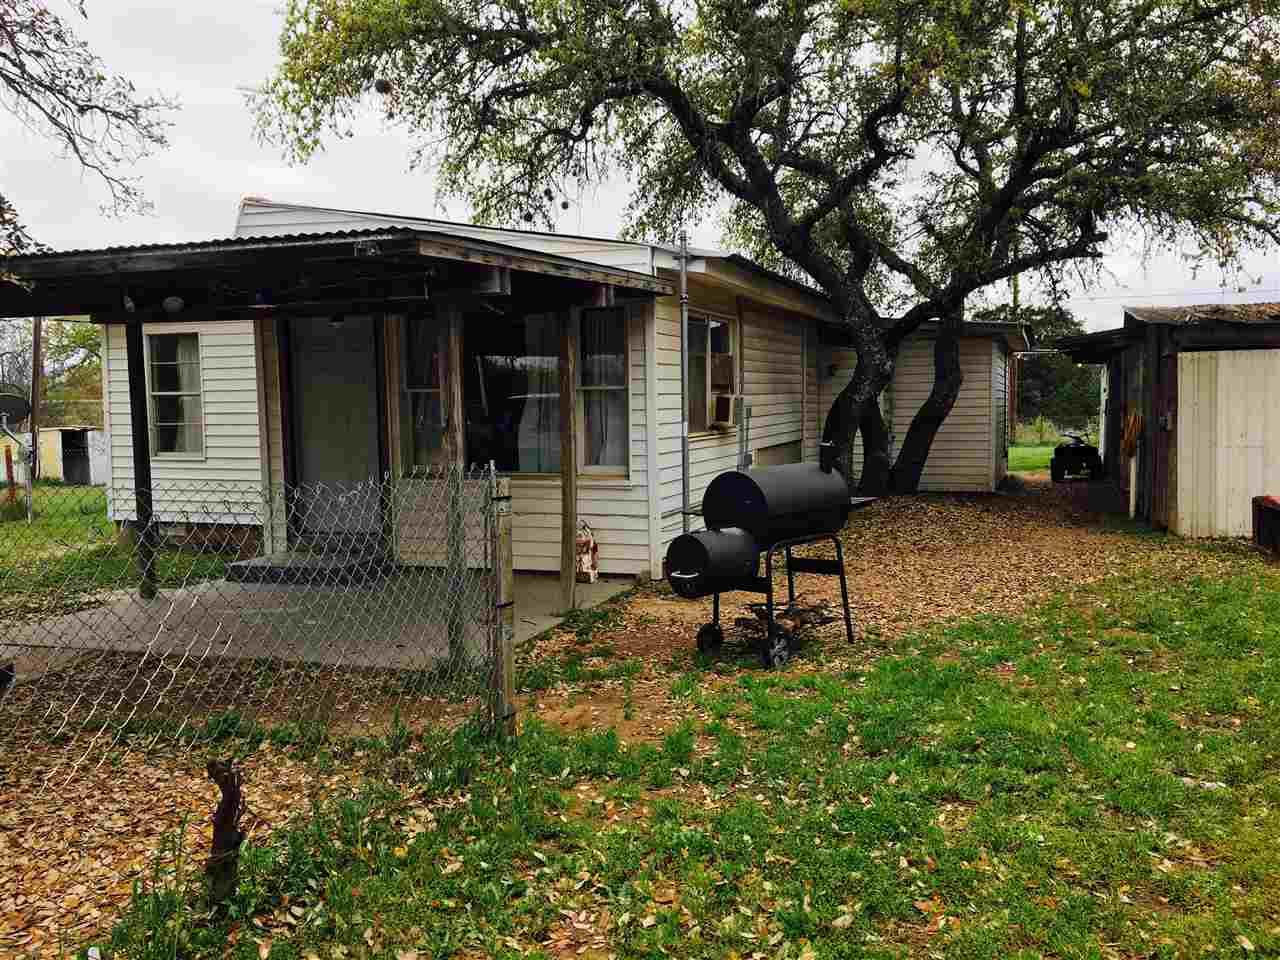 Kingsland, TX - Granite Shoals Cabin